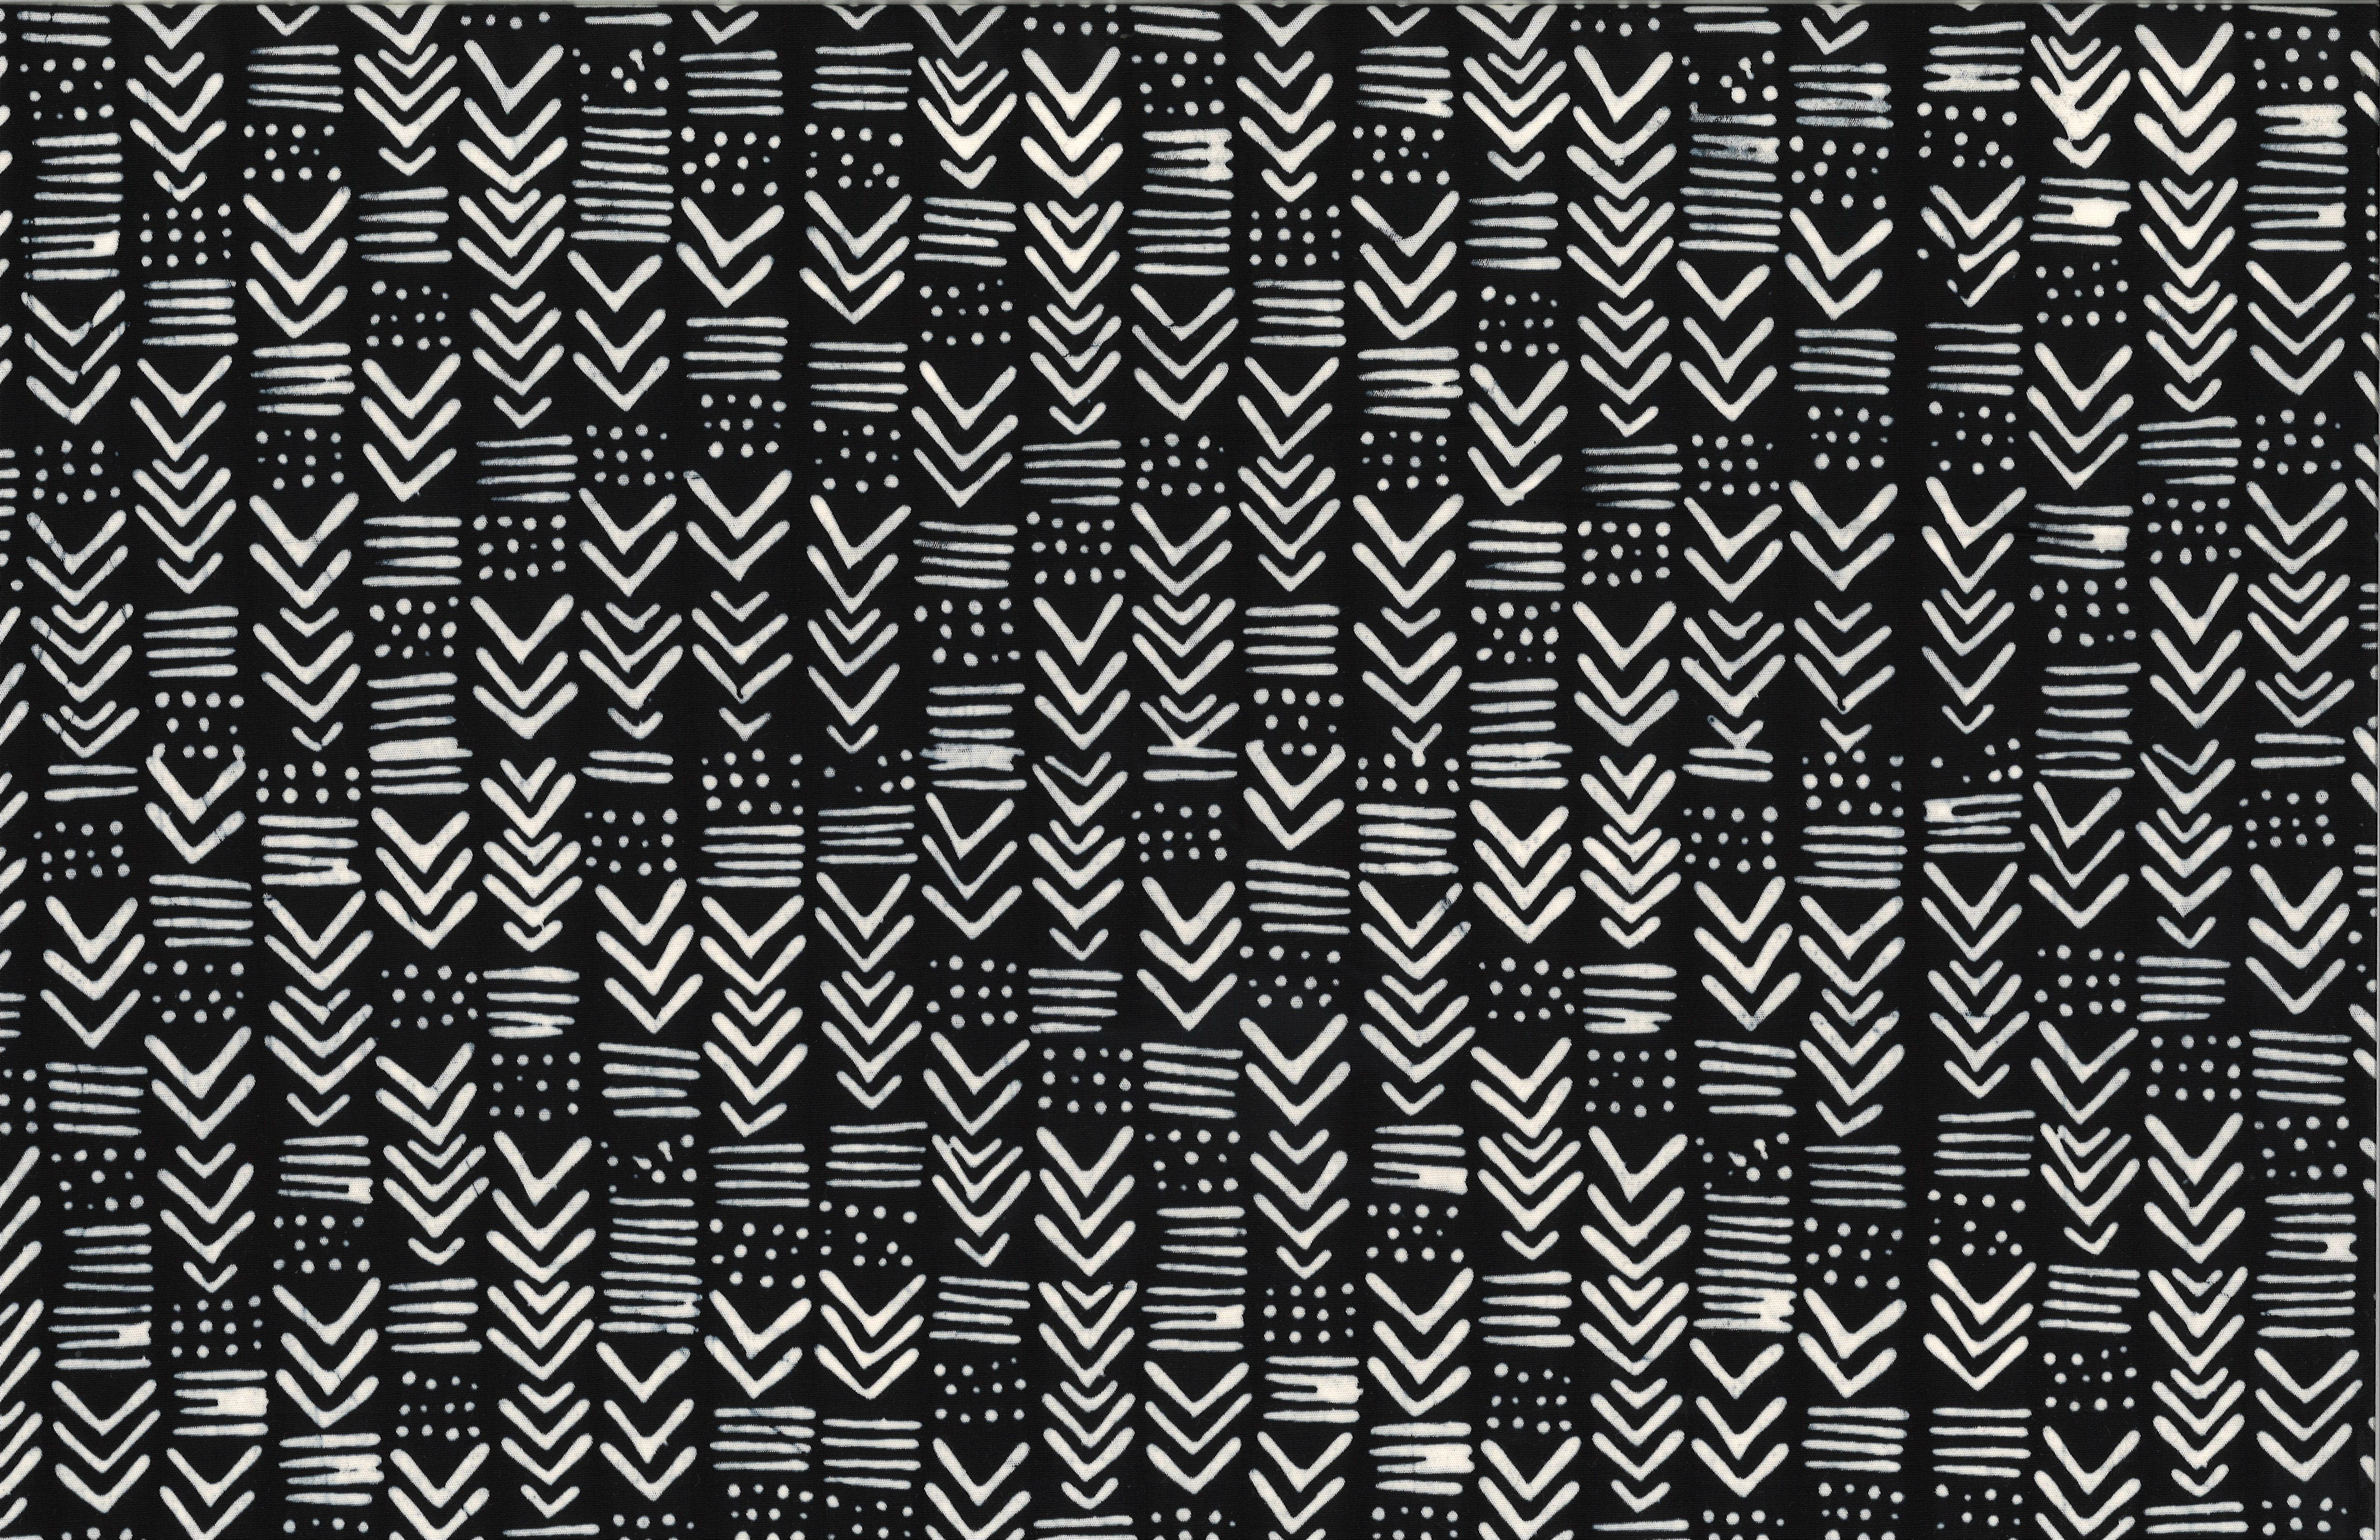 123 163-Zebra